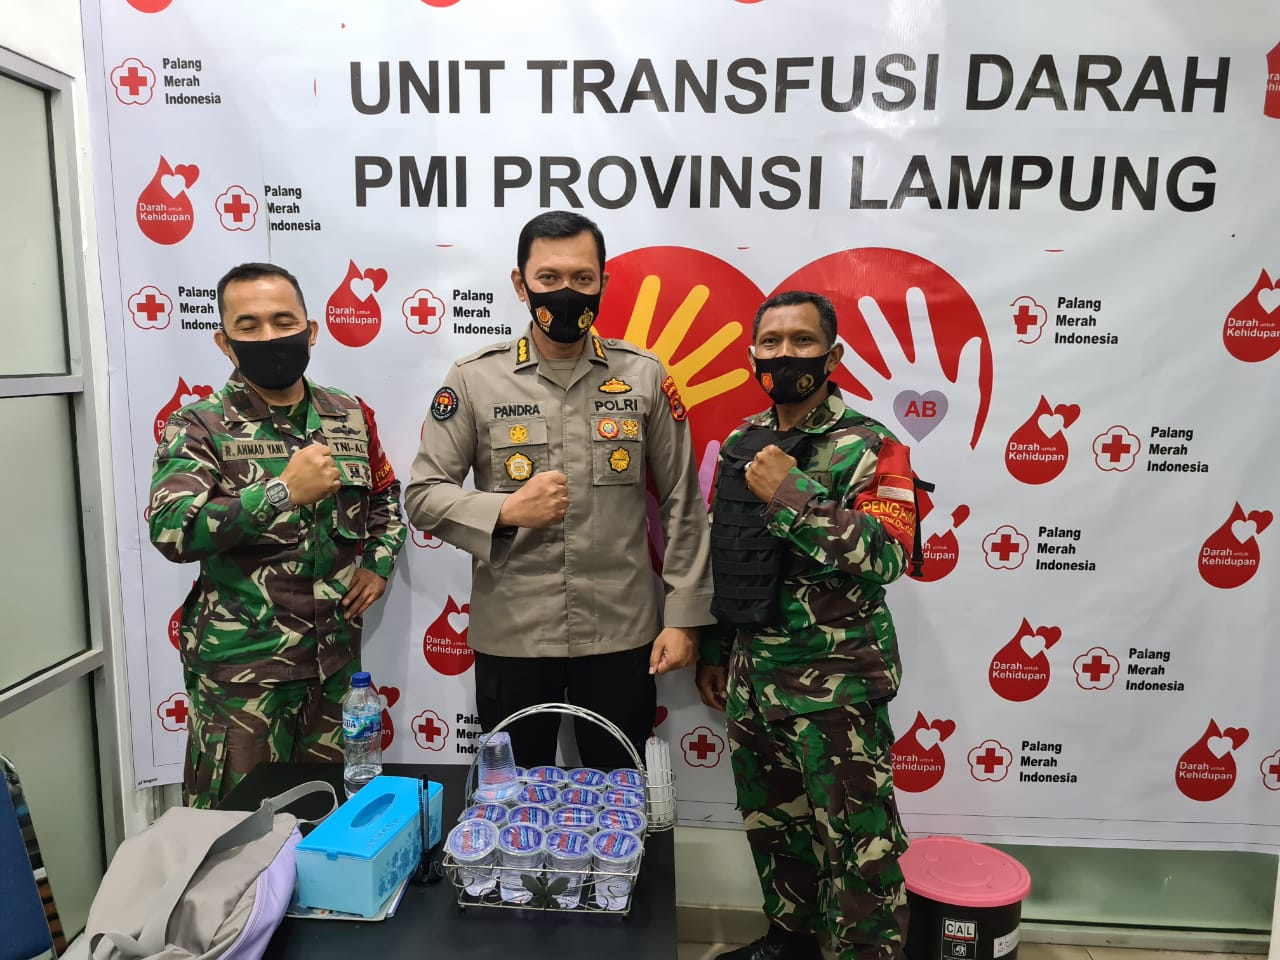 Luar biasa sudah 115 kali Kabid Humas Polda Lampung, Kombes Pol Zahwani Pandra Arsyad, secara sukarela mendonorkan darahnya ke PMI